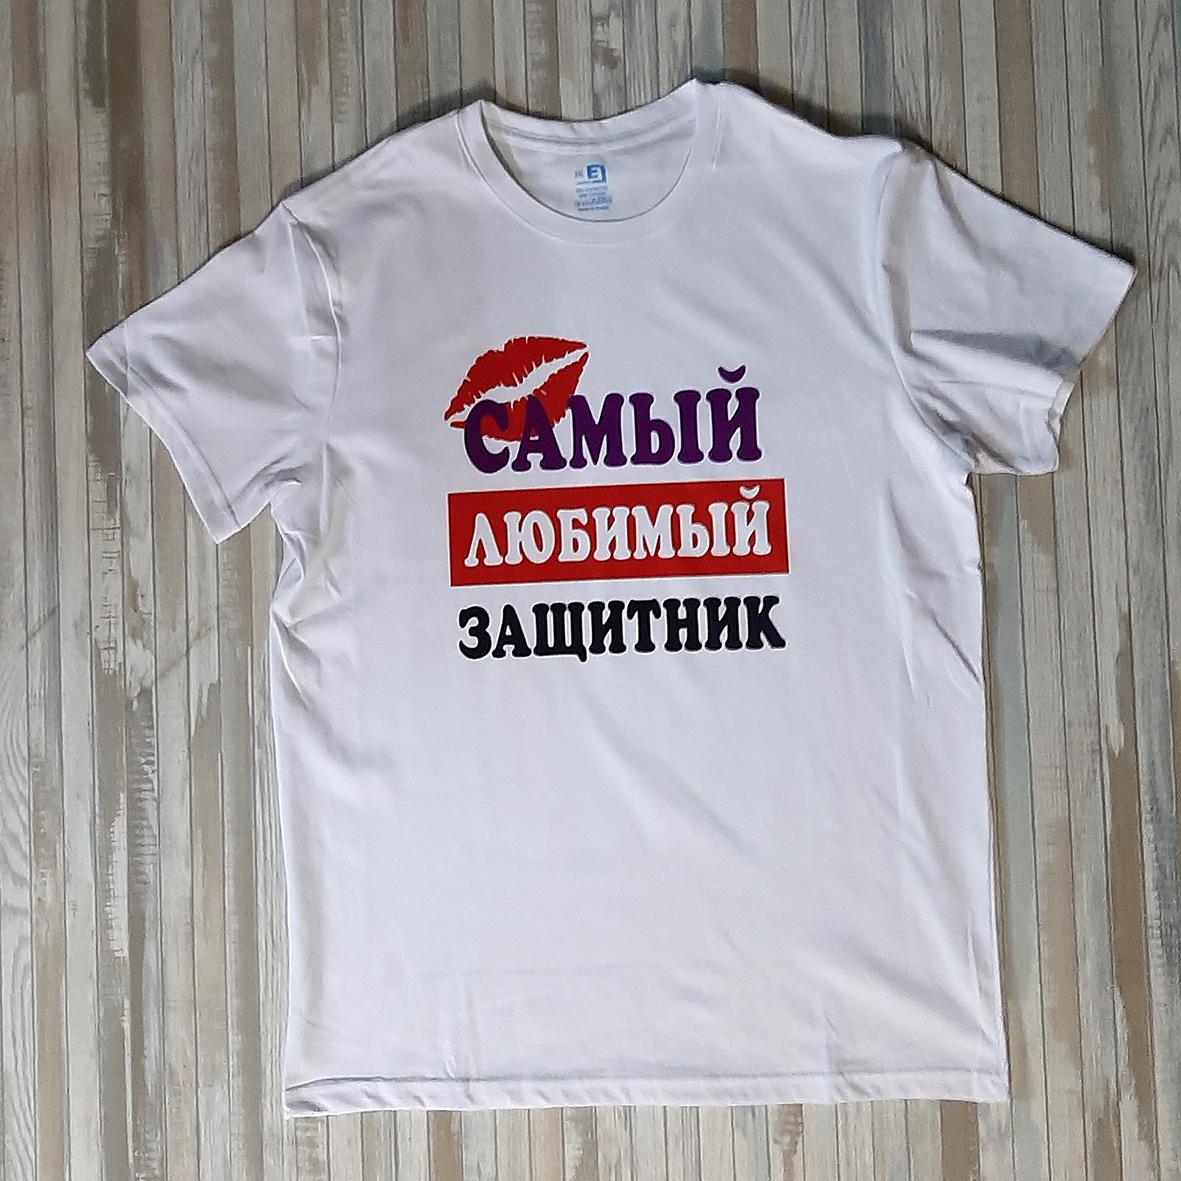 футболка для мужа